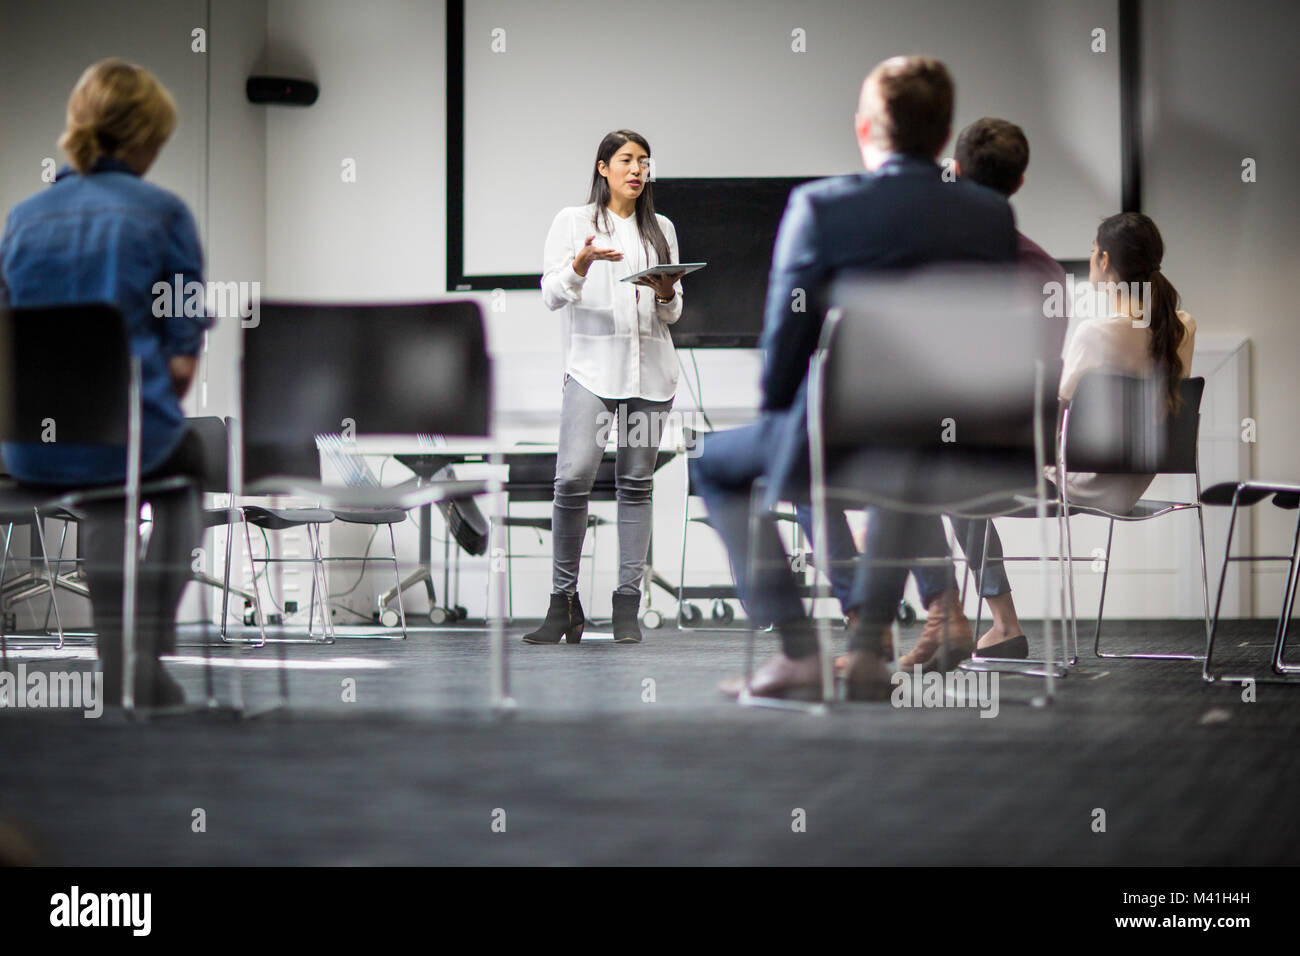 Female executive leading a  training conference - Stock Image